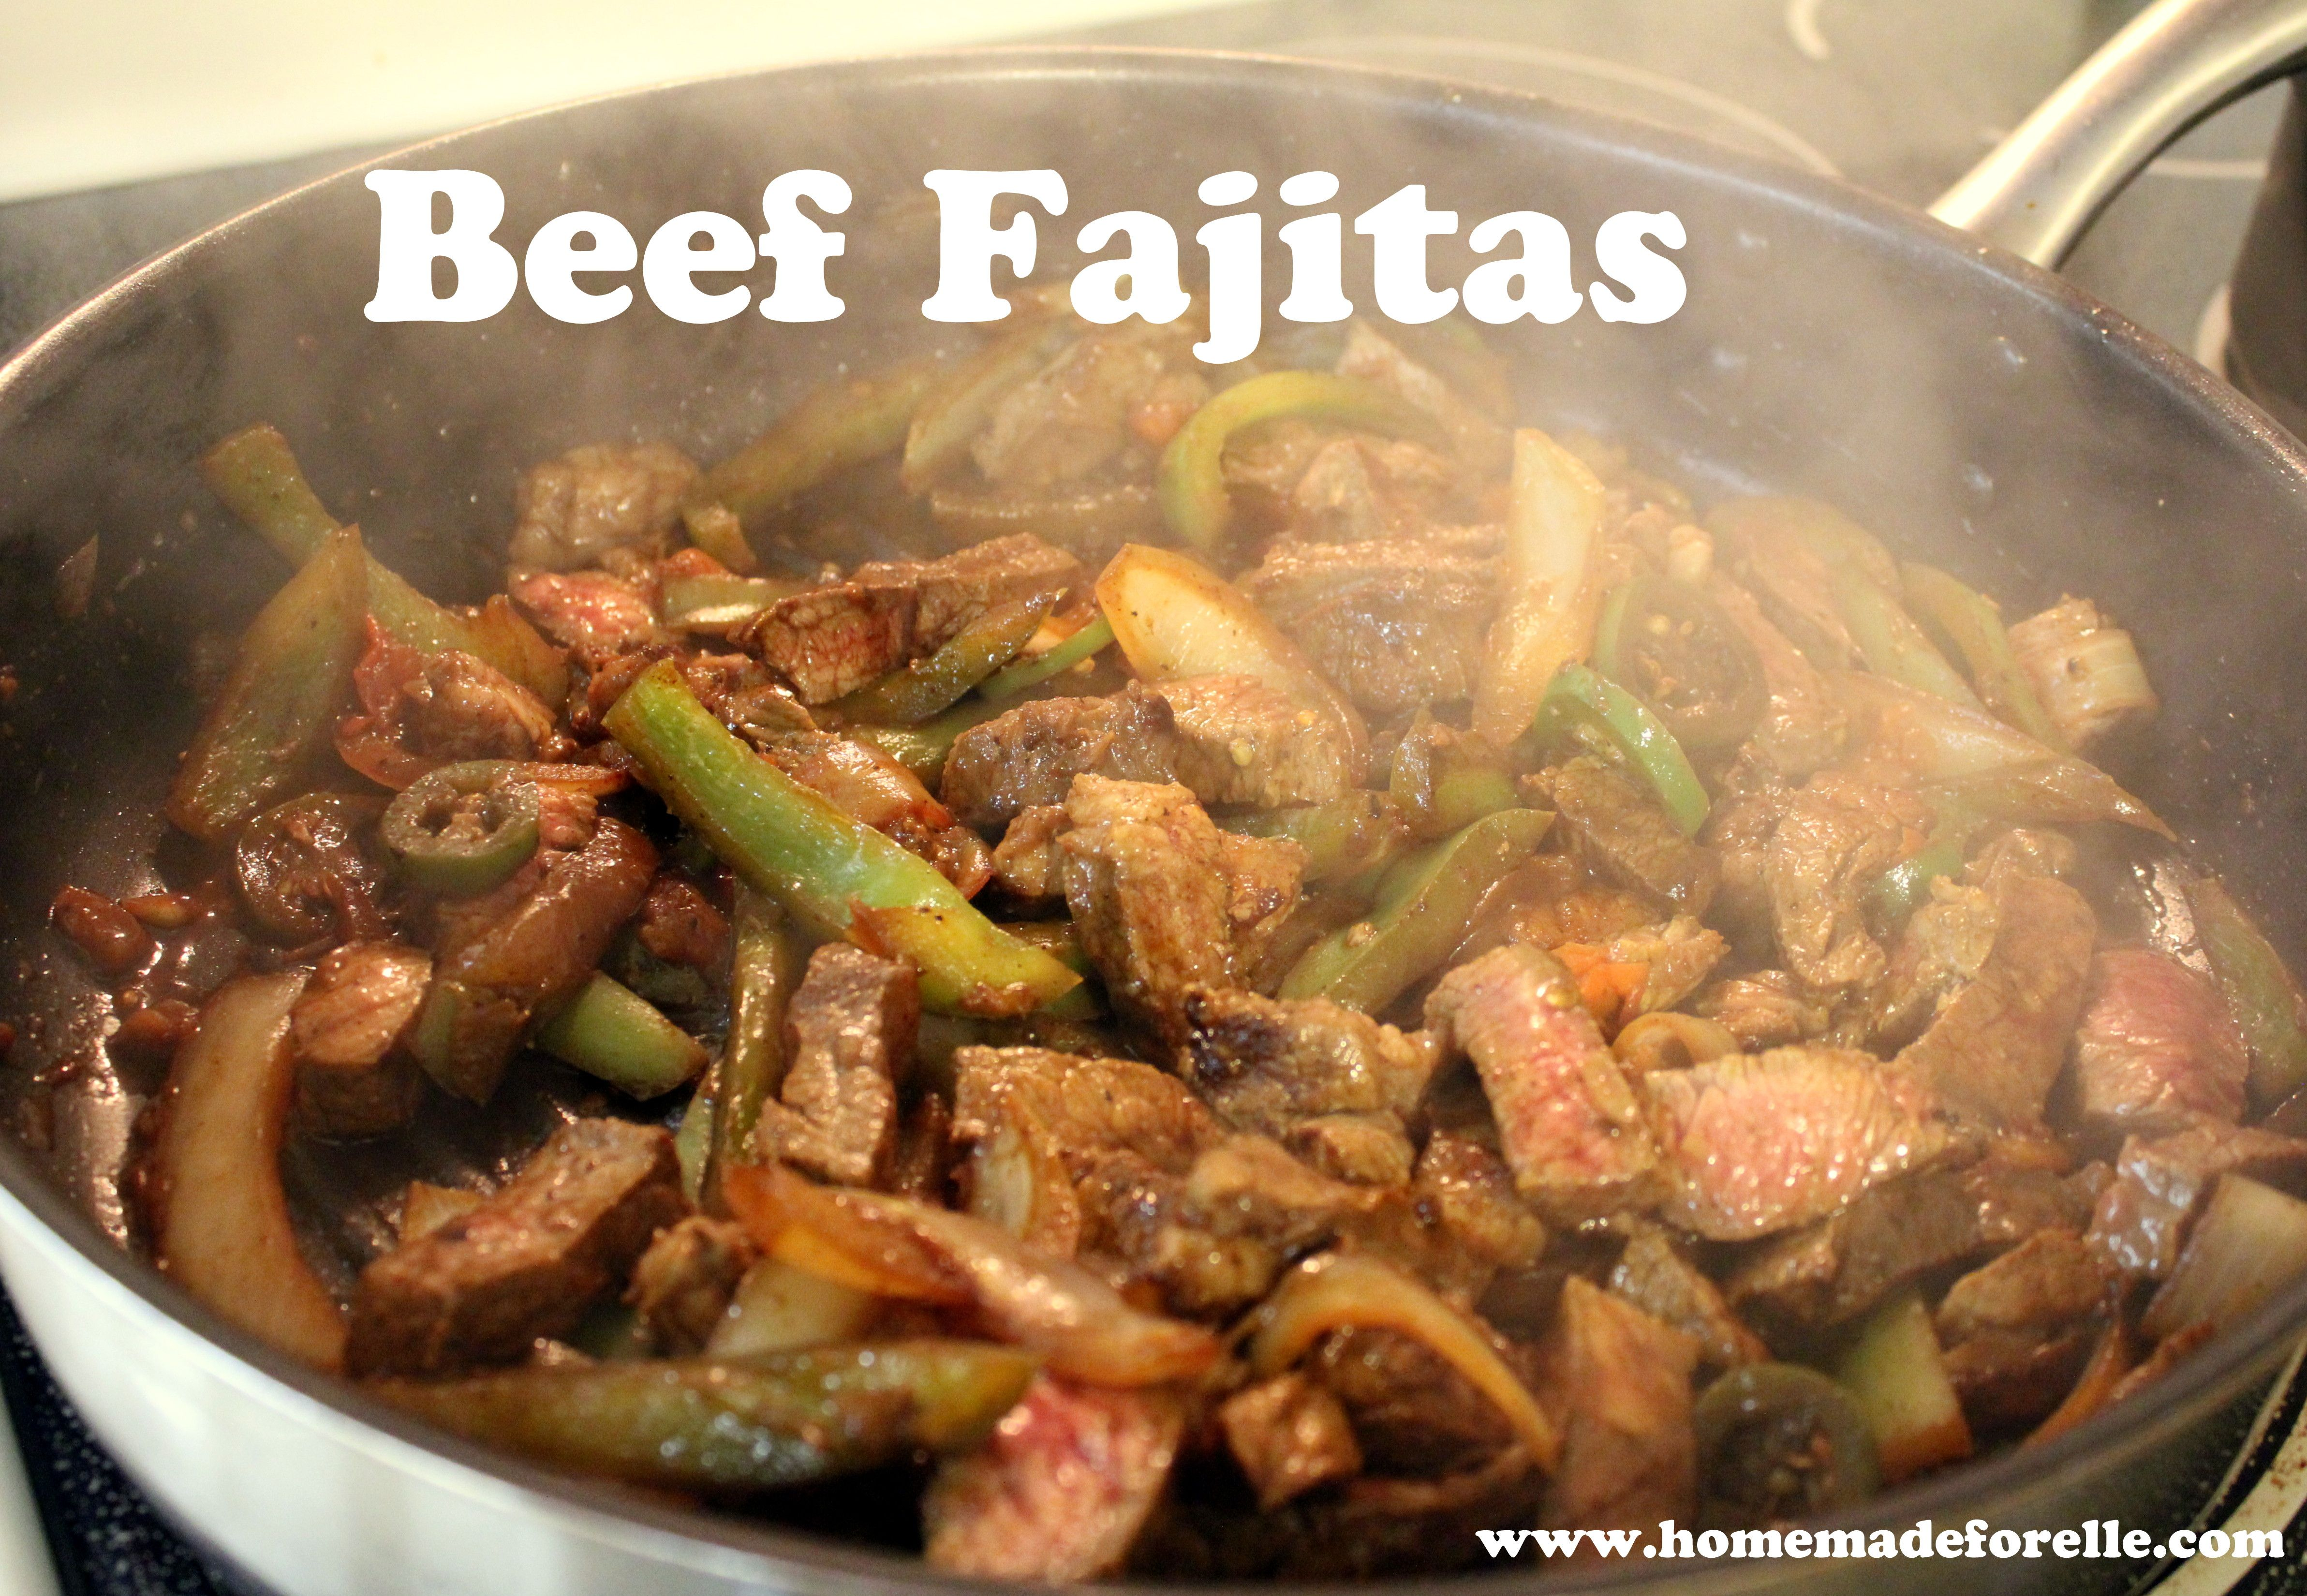 Finally - A Good Recipe for Beef Fajitas #beeffajitarecipe